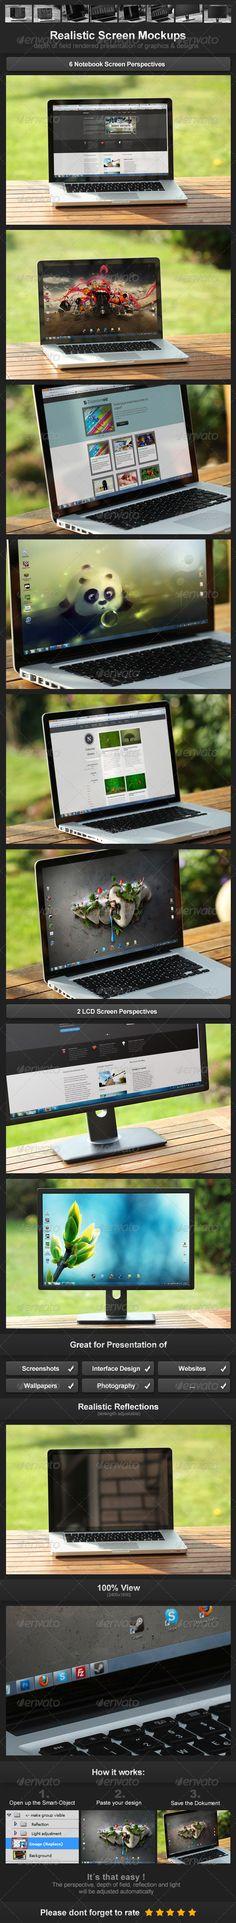 Realistic Screen Mockups - Monitors Displays